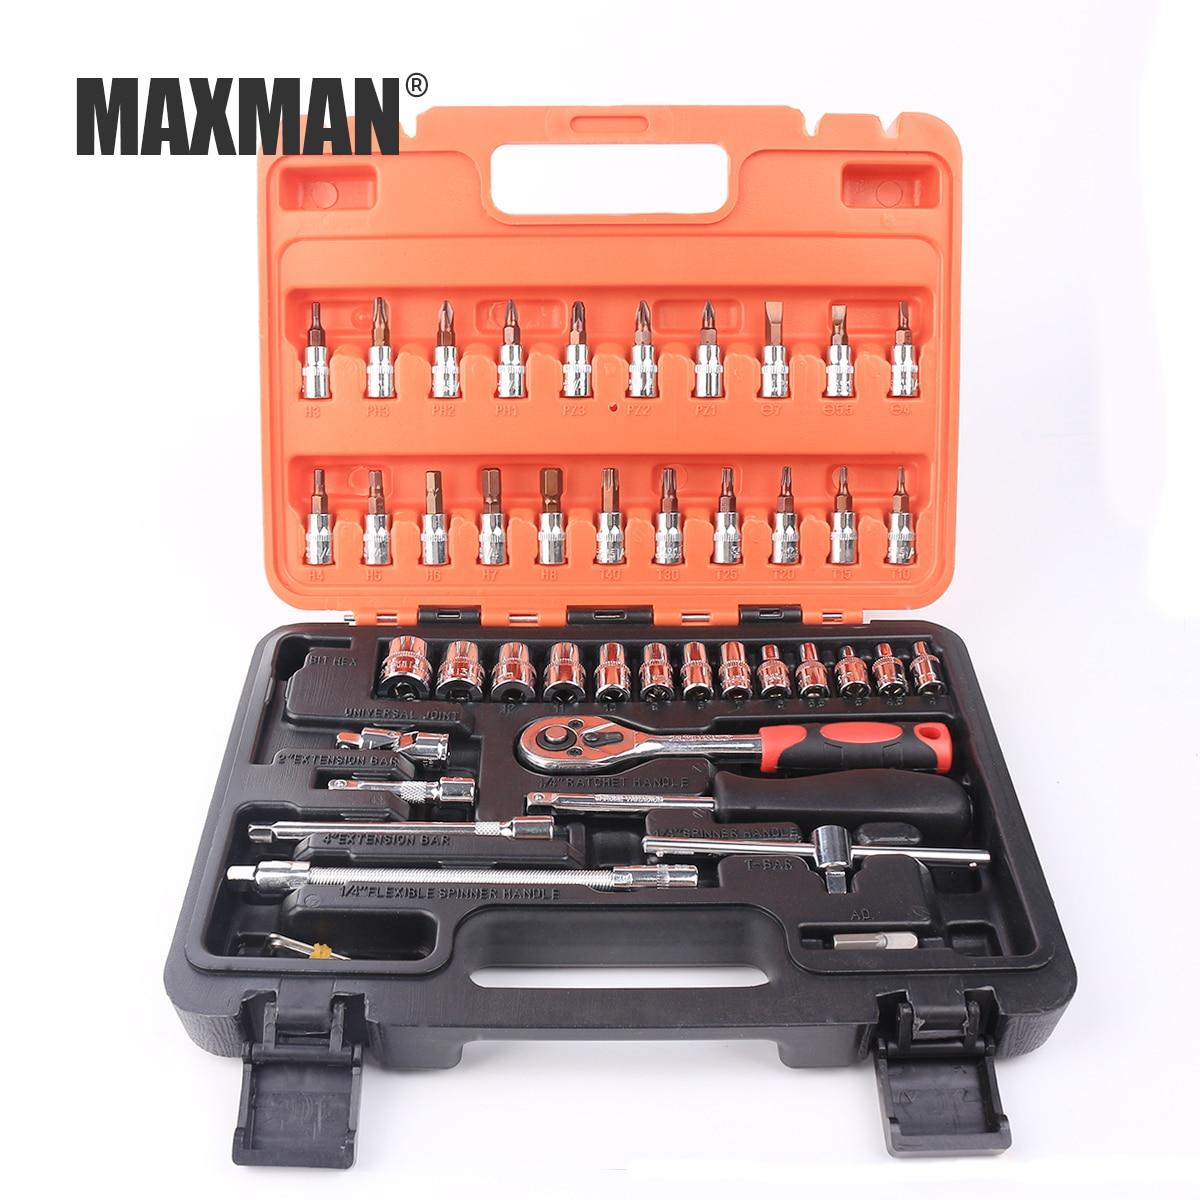 MAXMAN 46pcs/set Hand Tool Kit Socket Ratchet Torque Wrench Extension Bar Drill Bits Automobiles Repair Tools Kit Multifunction